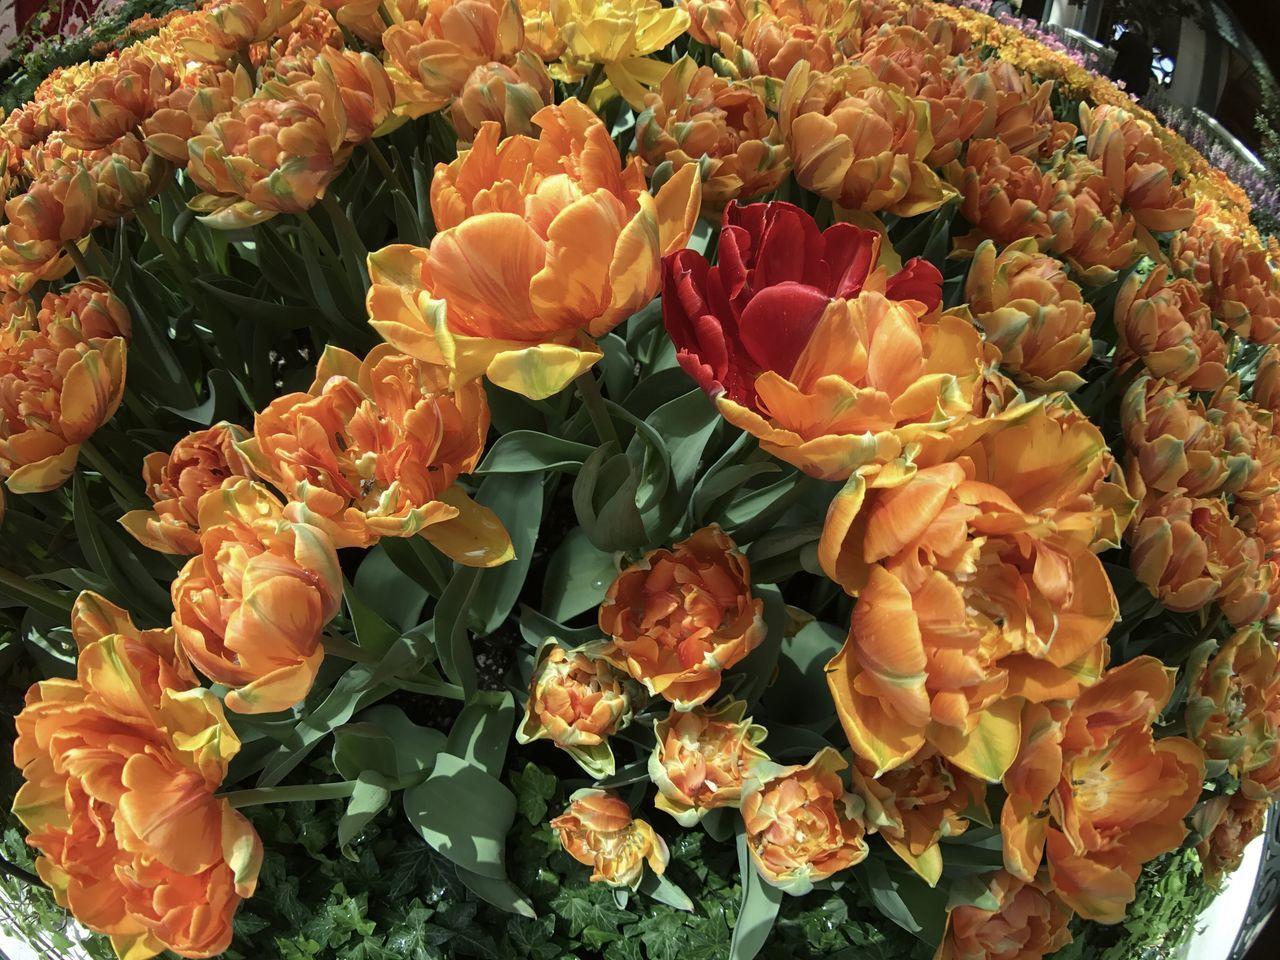 flower, freshness, petal, fragility, rose - flower, flower head, bouquet, beauty in nature, no people, flower market, nature, variation, close-up, flower shop, outdoors, day